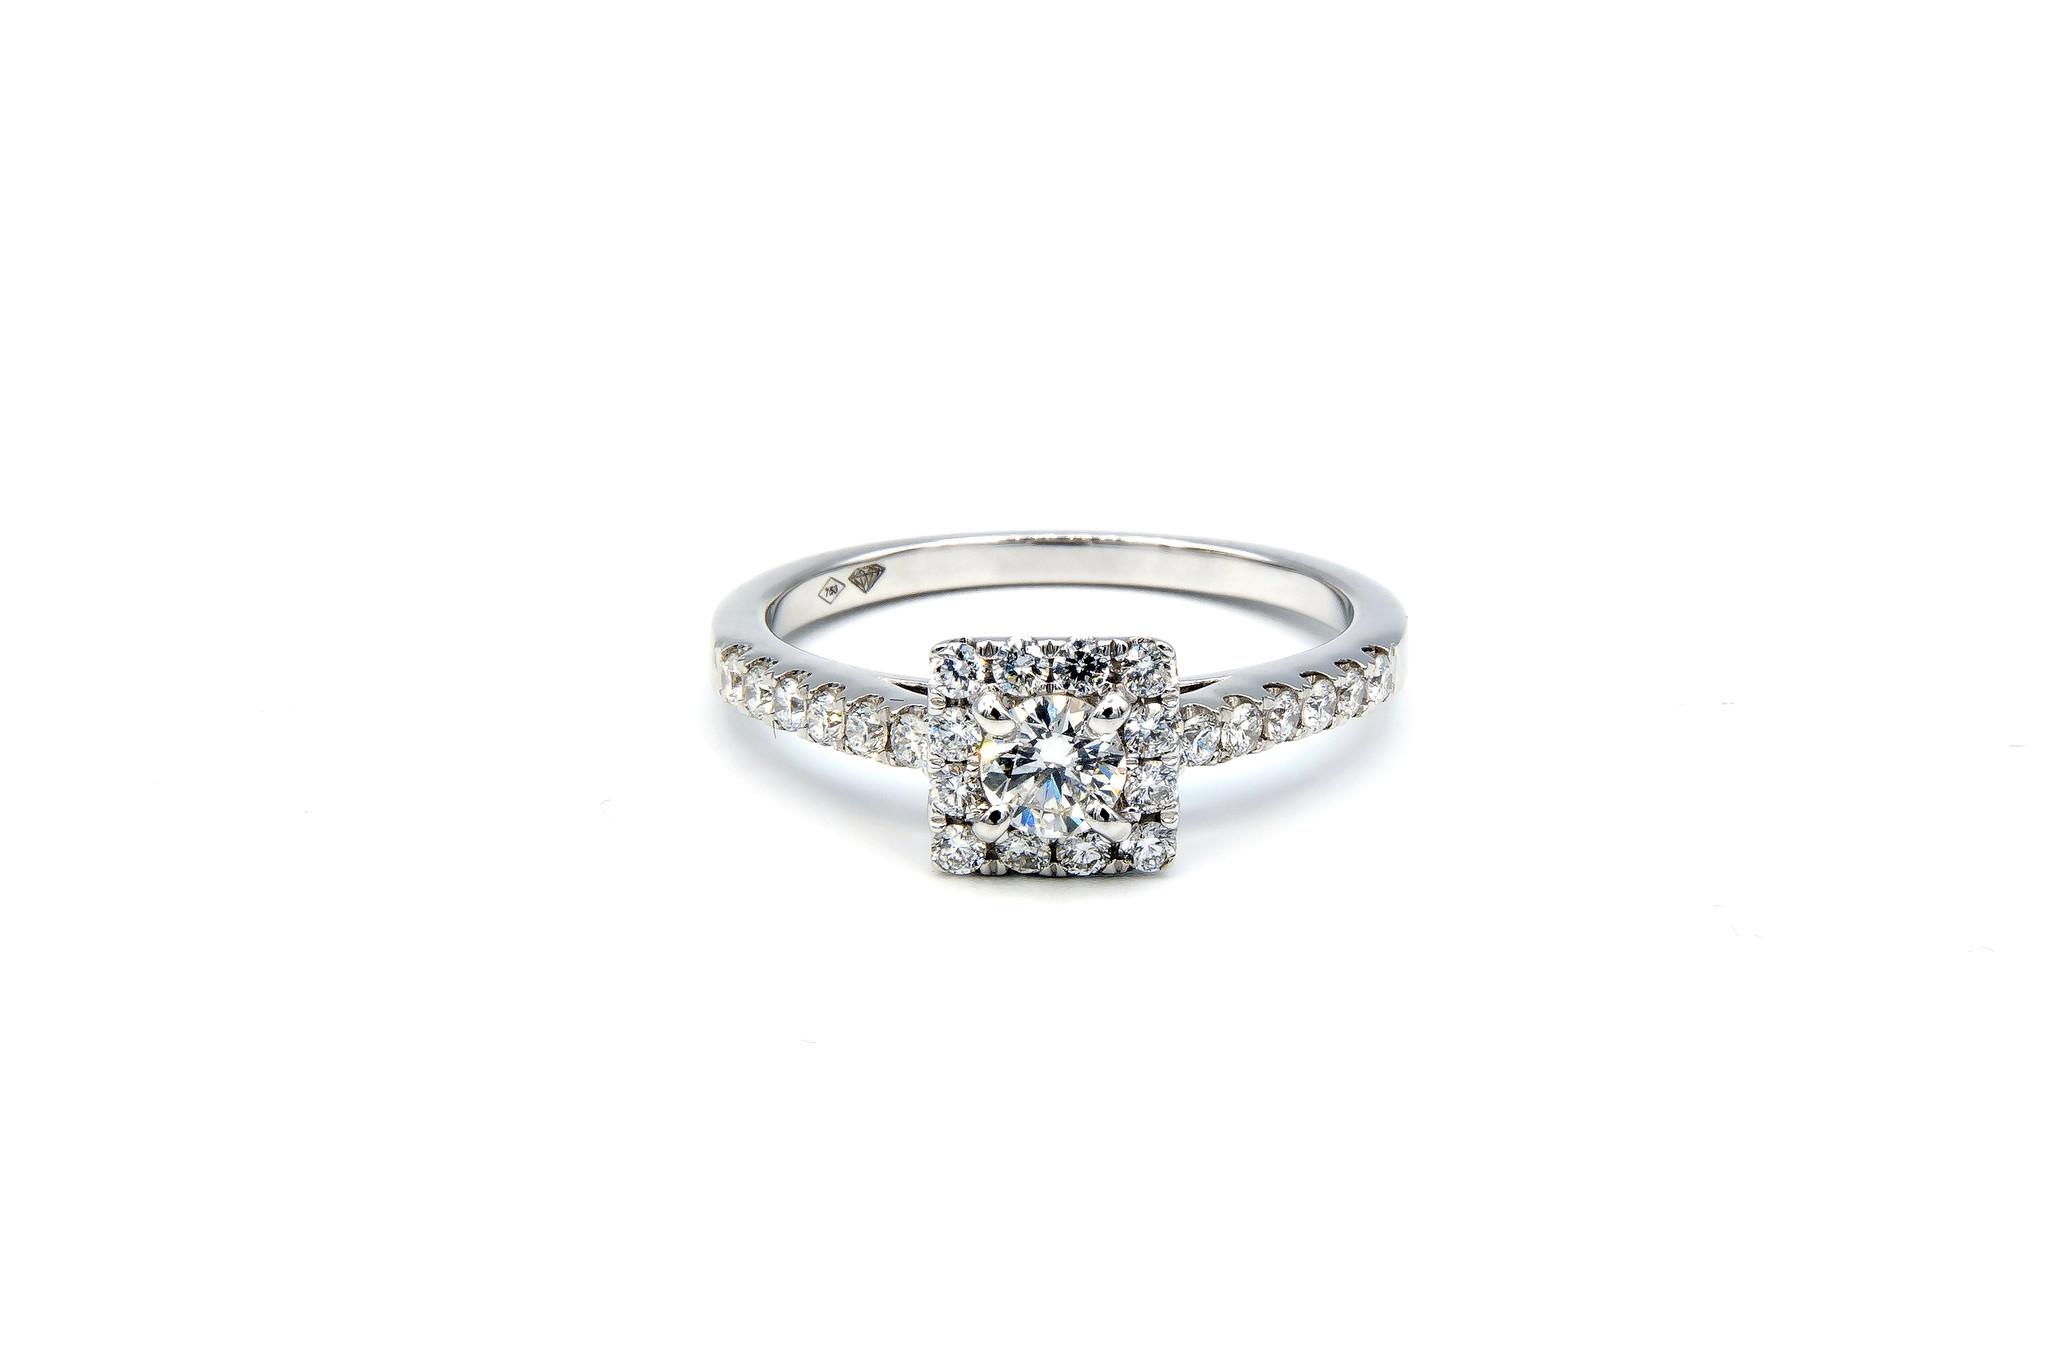 Ring verlovingsring witgoud met 0,2 ct SI en 0,28 ct VS diamant-1